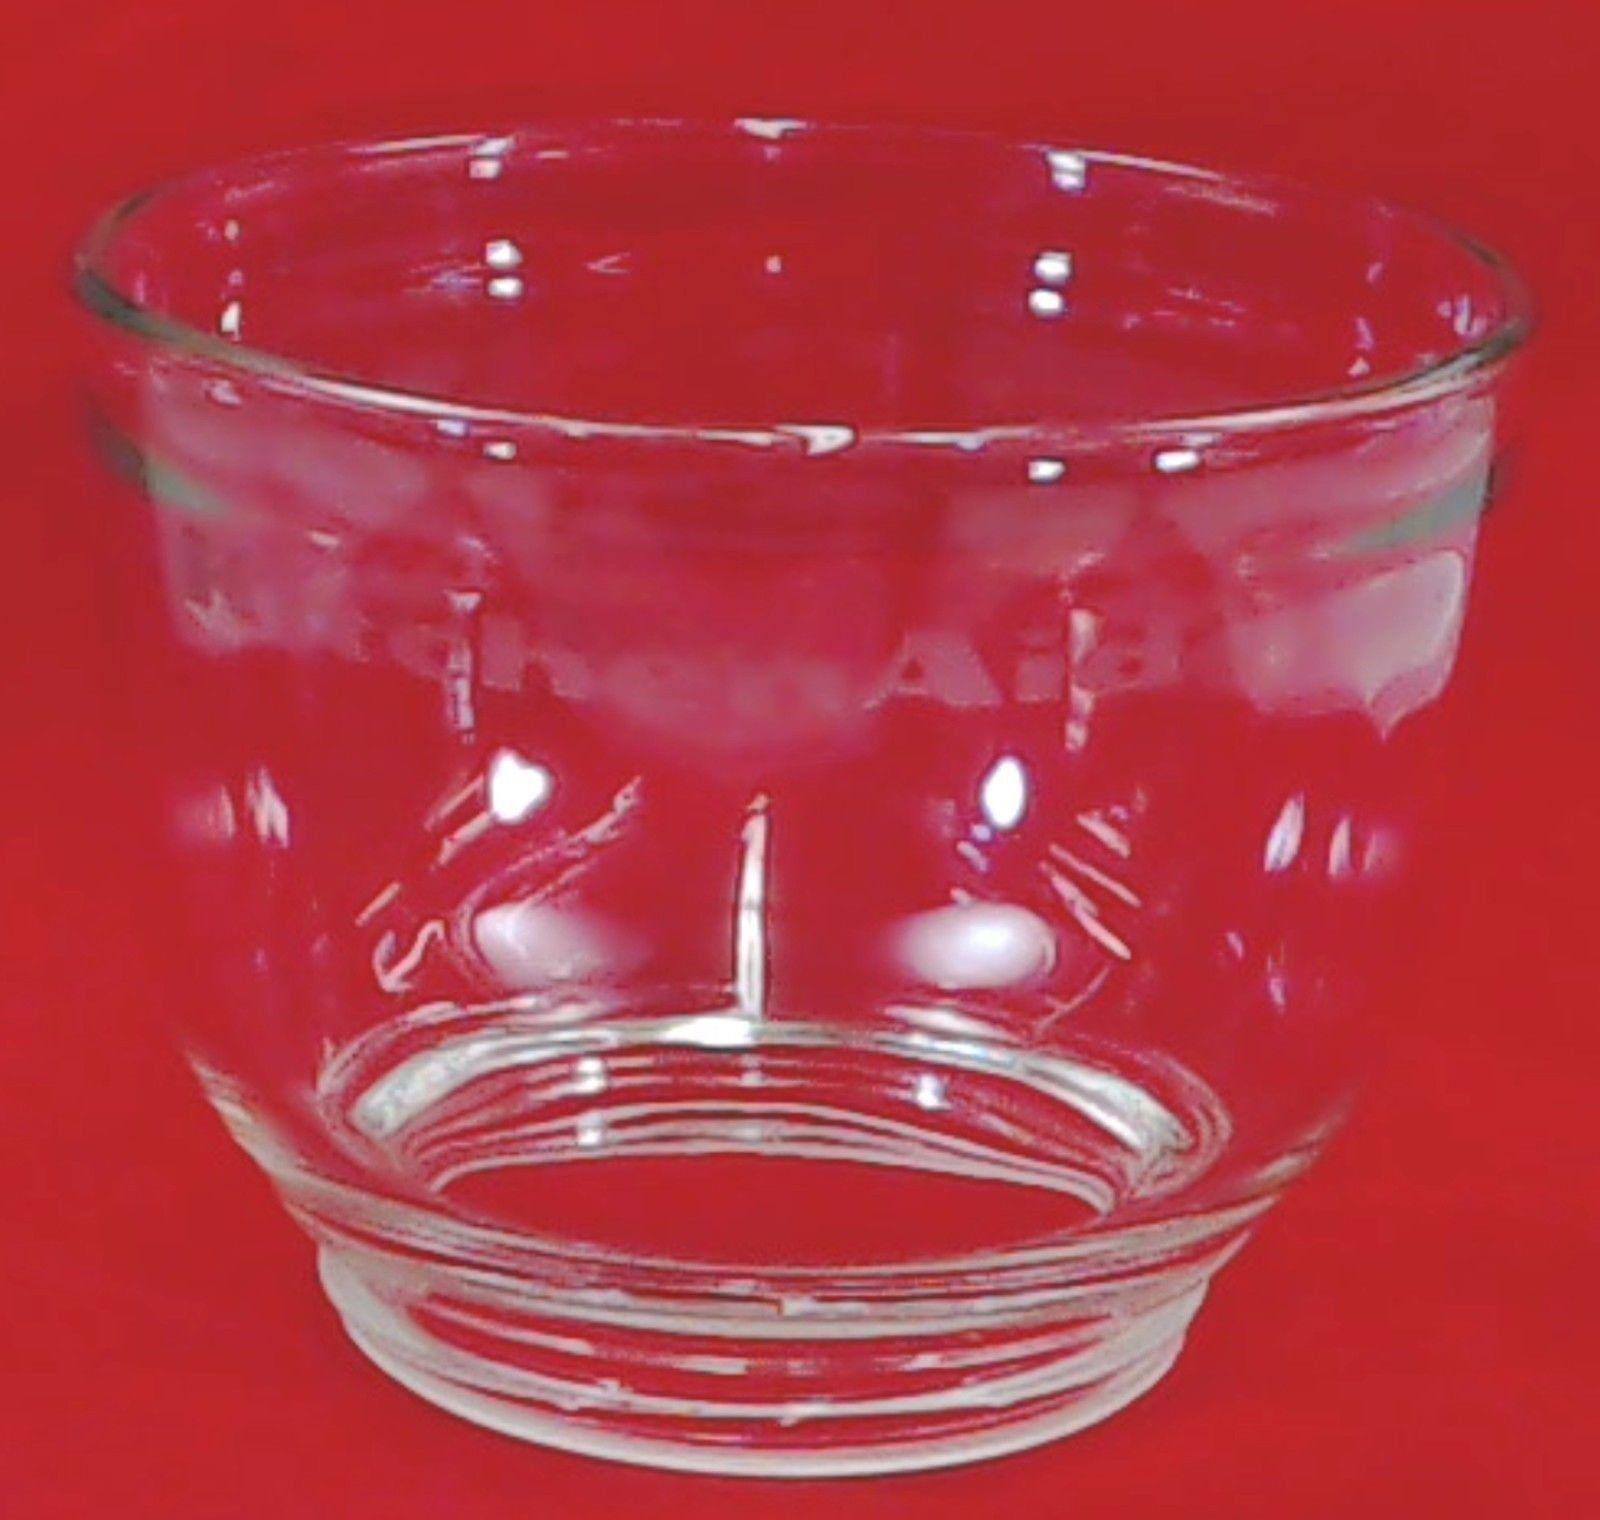 Whirlpool KitchenAid Coffee Grinder Bean Jar, AP3790452, PS970874, 4176730